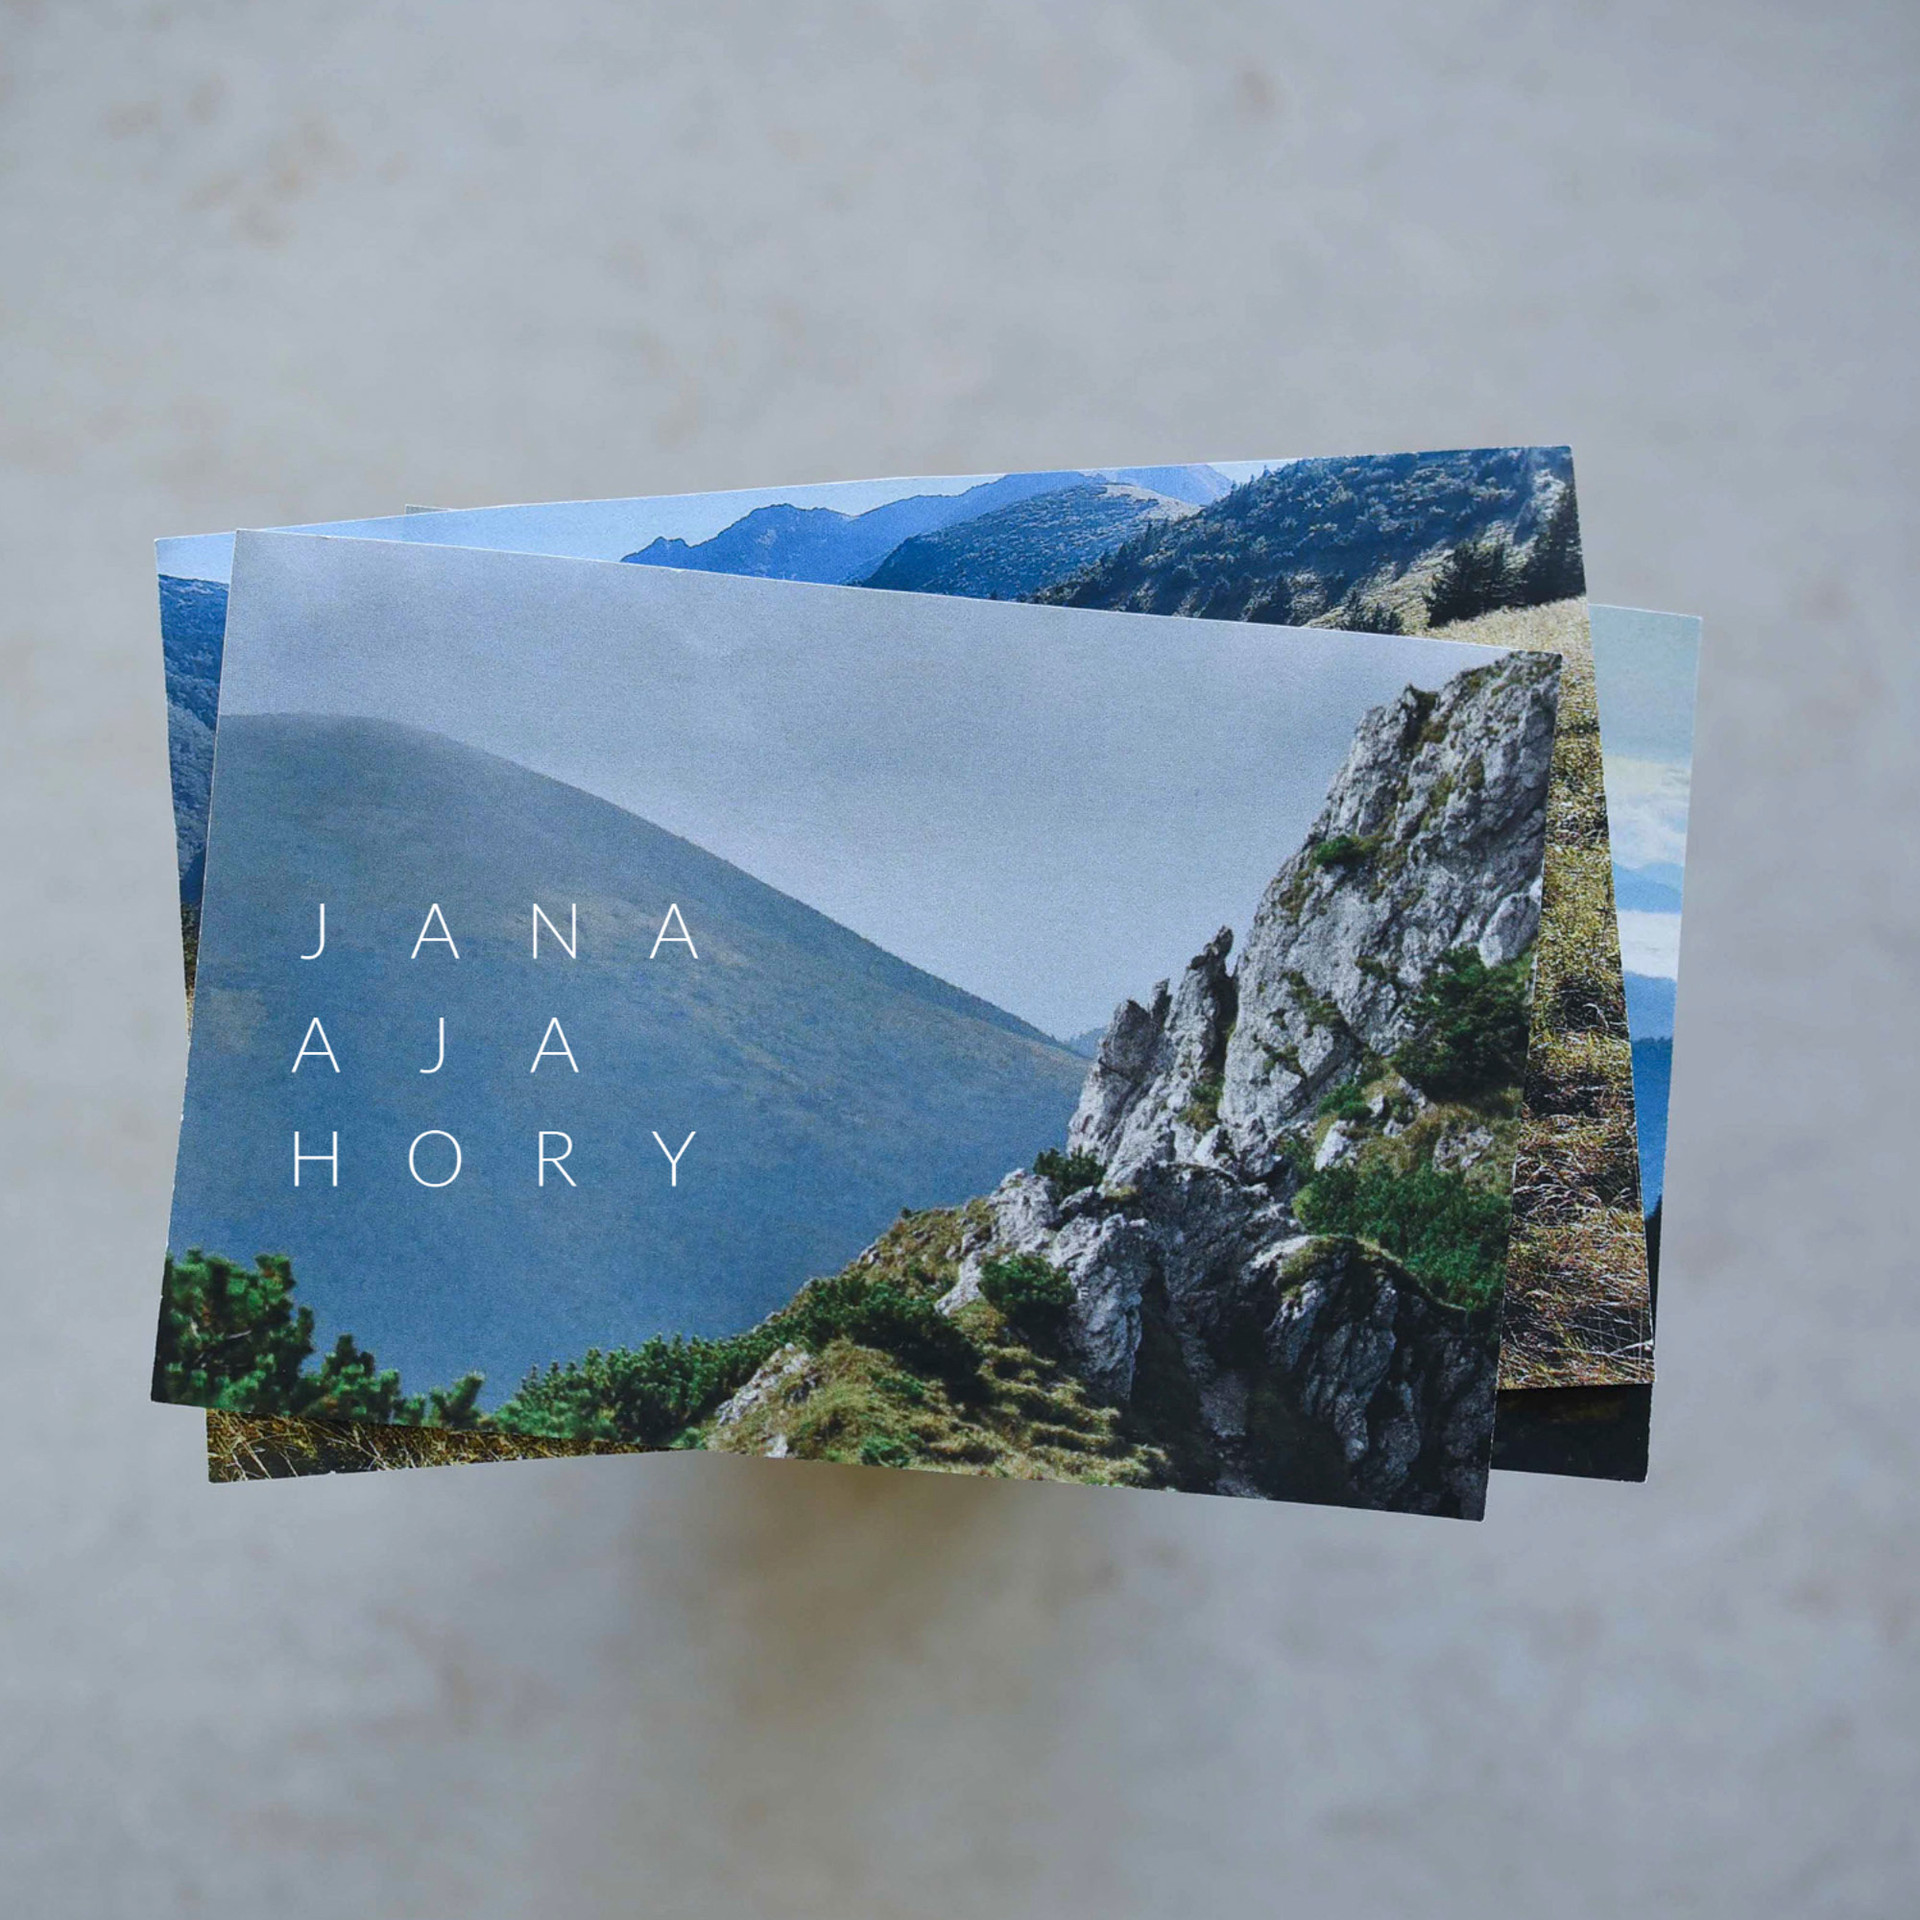 Jana-a-ja-Hory-EP-cover.jpg